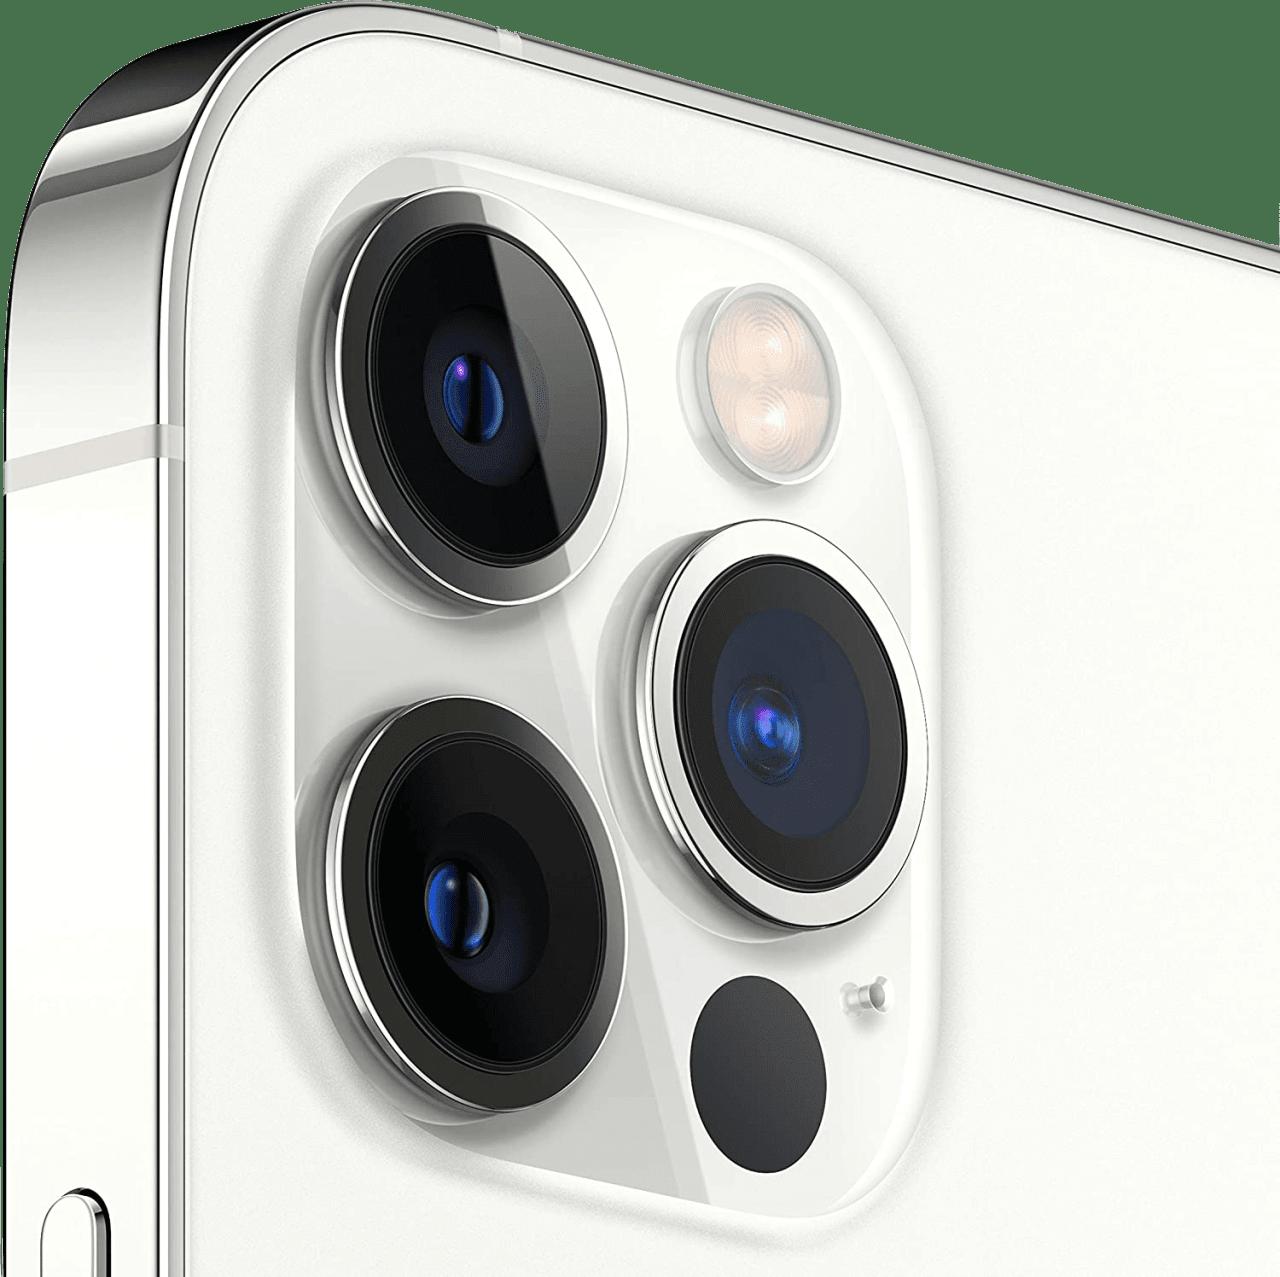 Silver Apple iPhone 12 Pro Max 512GB.4